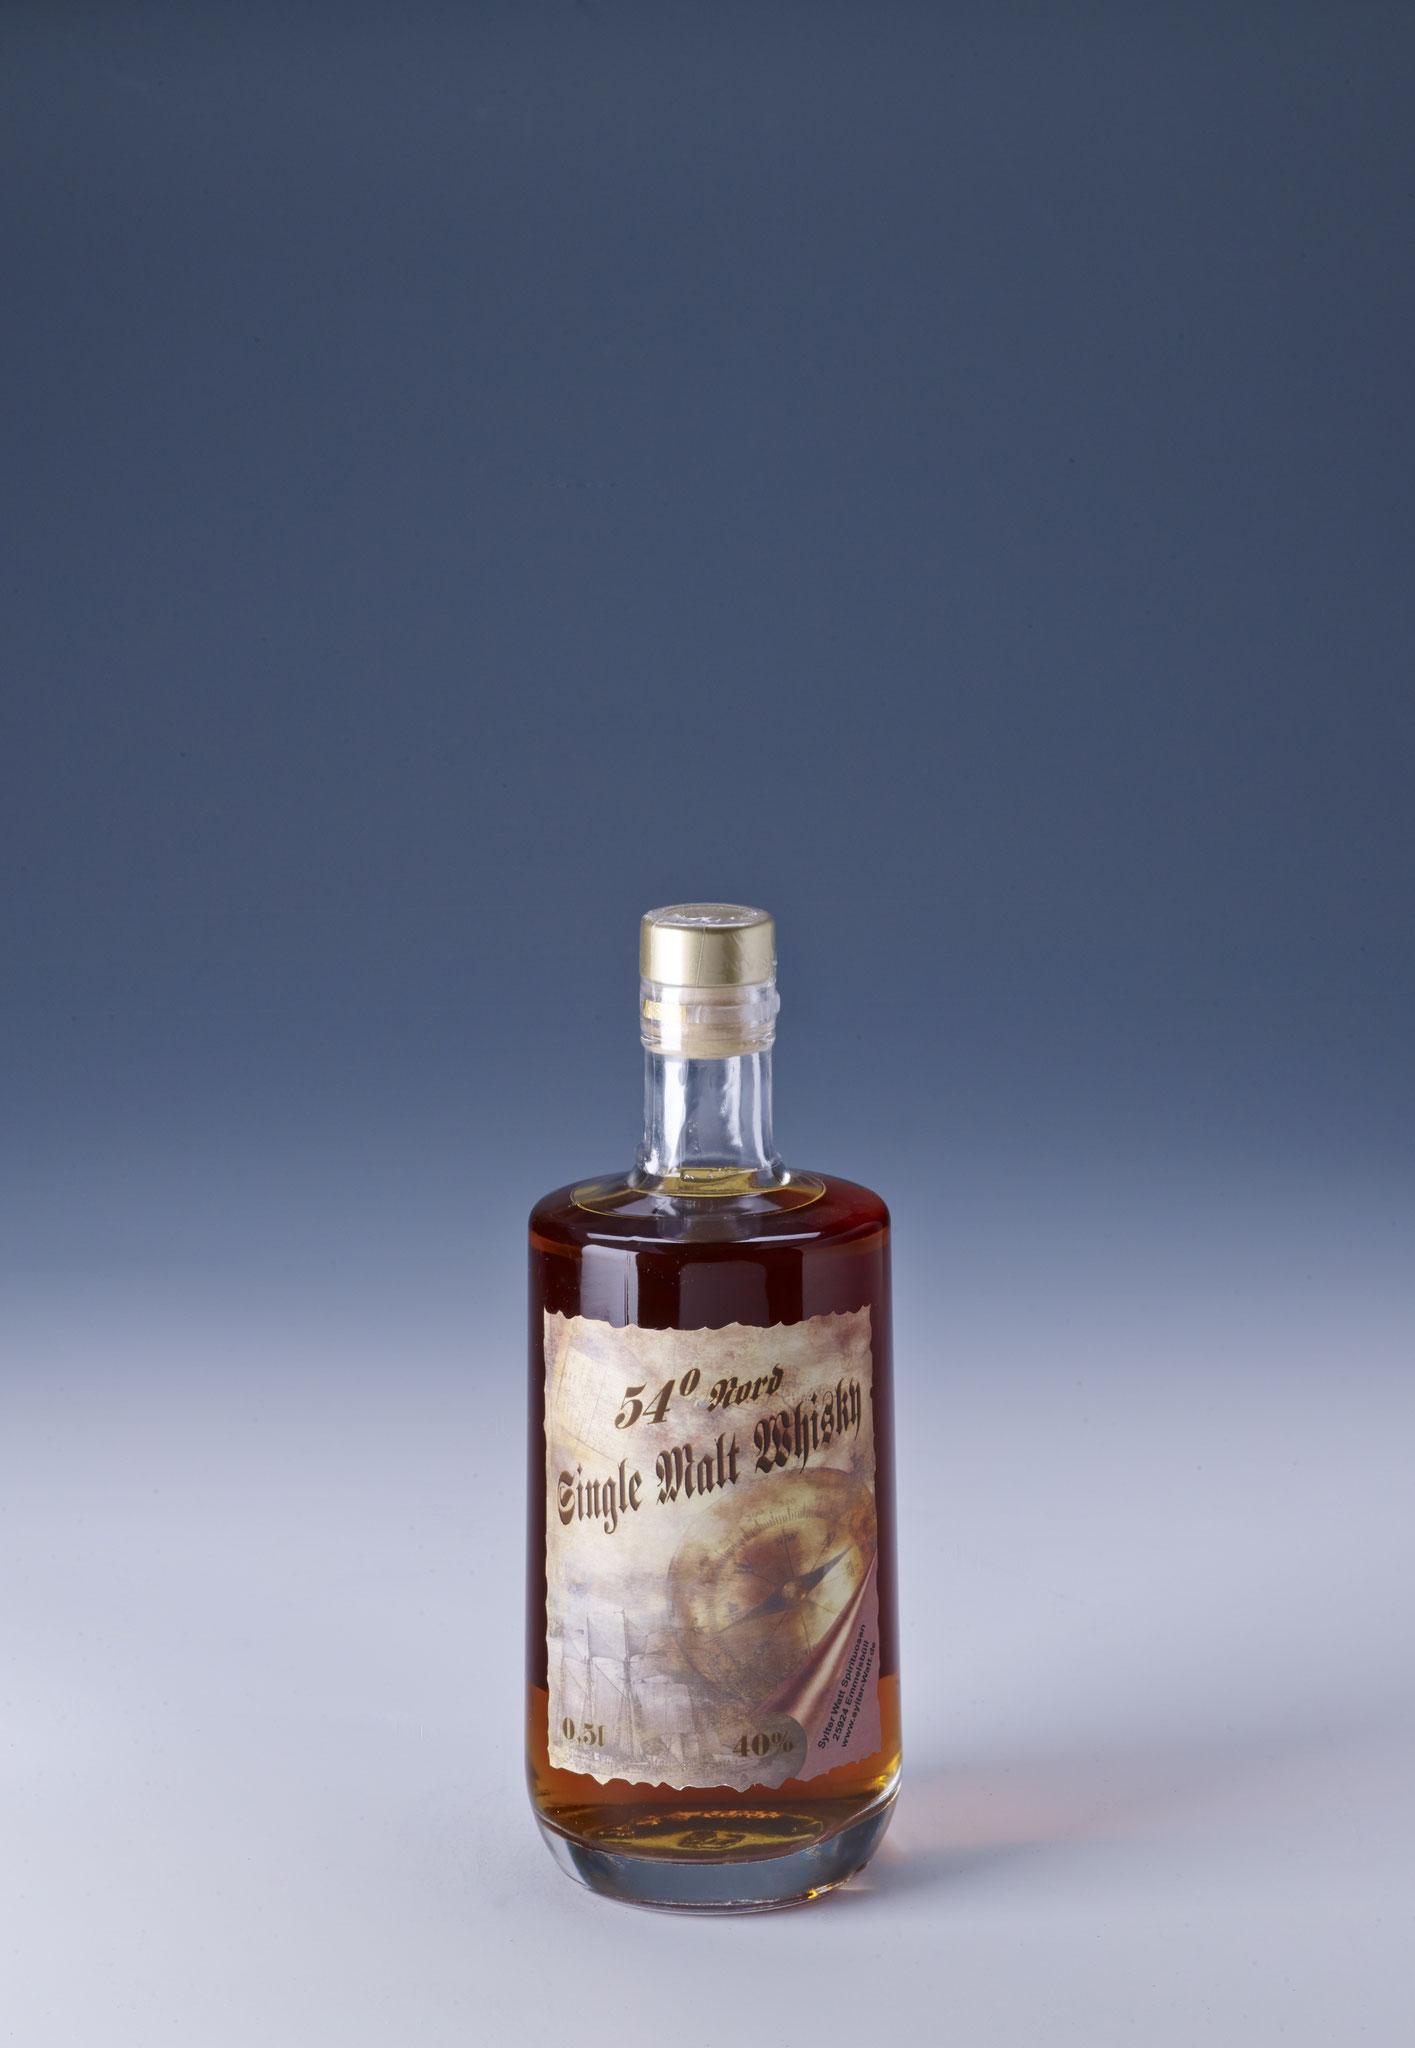 Blaue Maus Whiskydestillerie Eggolsheim